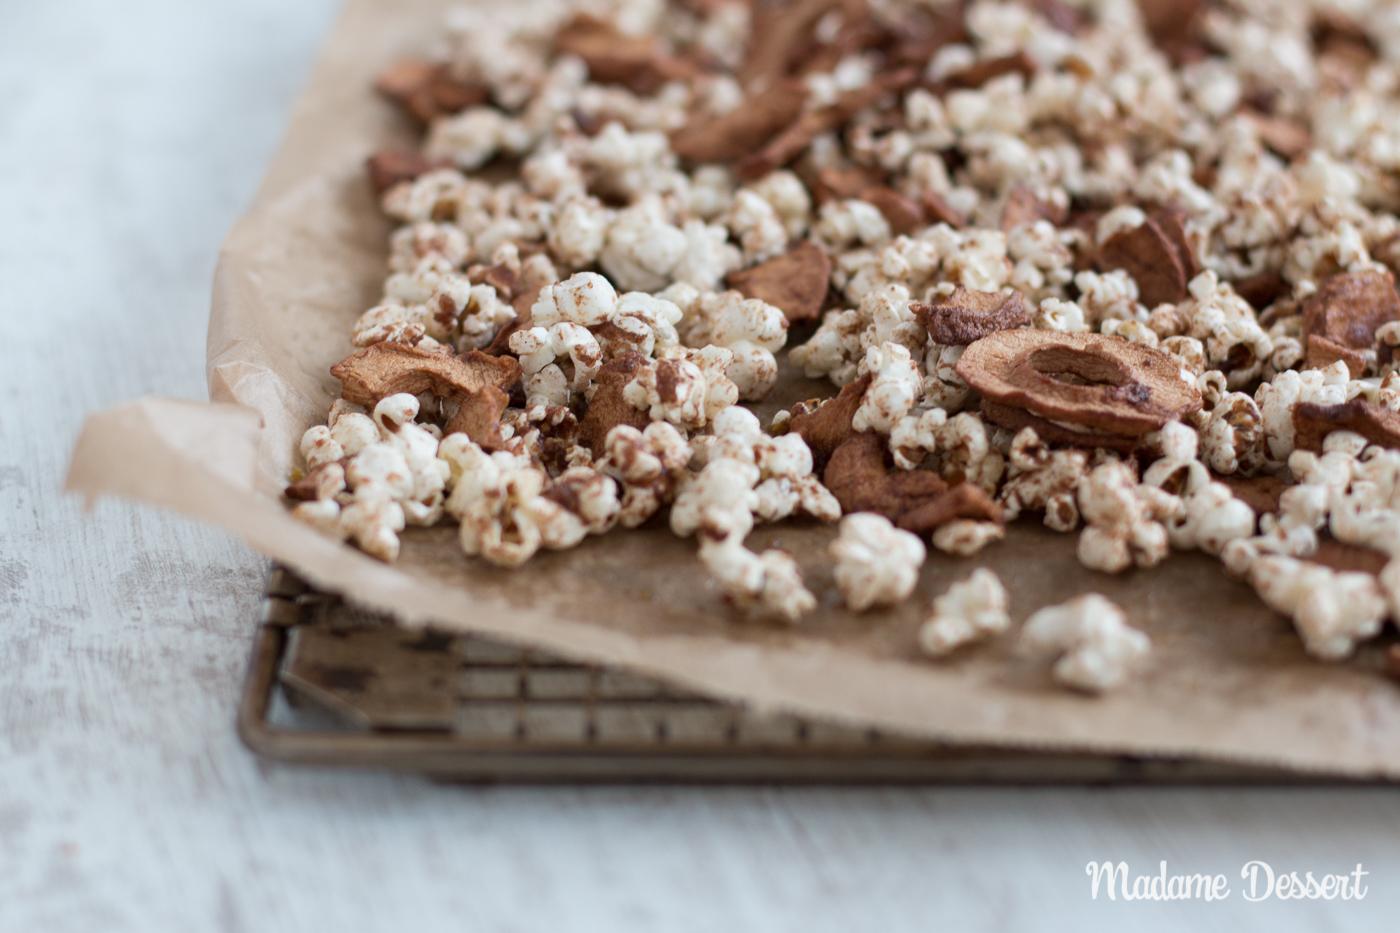 Selbstgemachtes Popcorn mal anders – Apfel-Zimt Popcorn | Madame Dessert